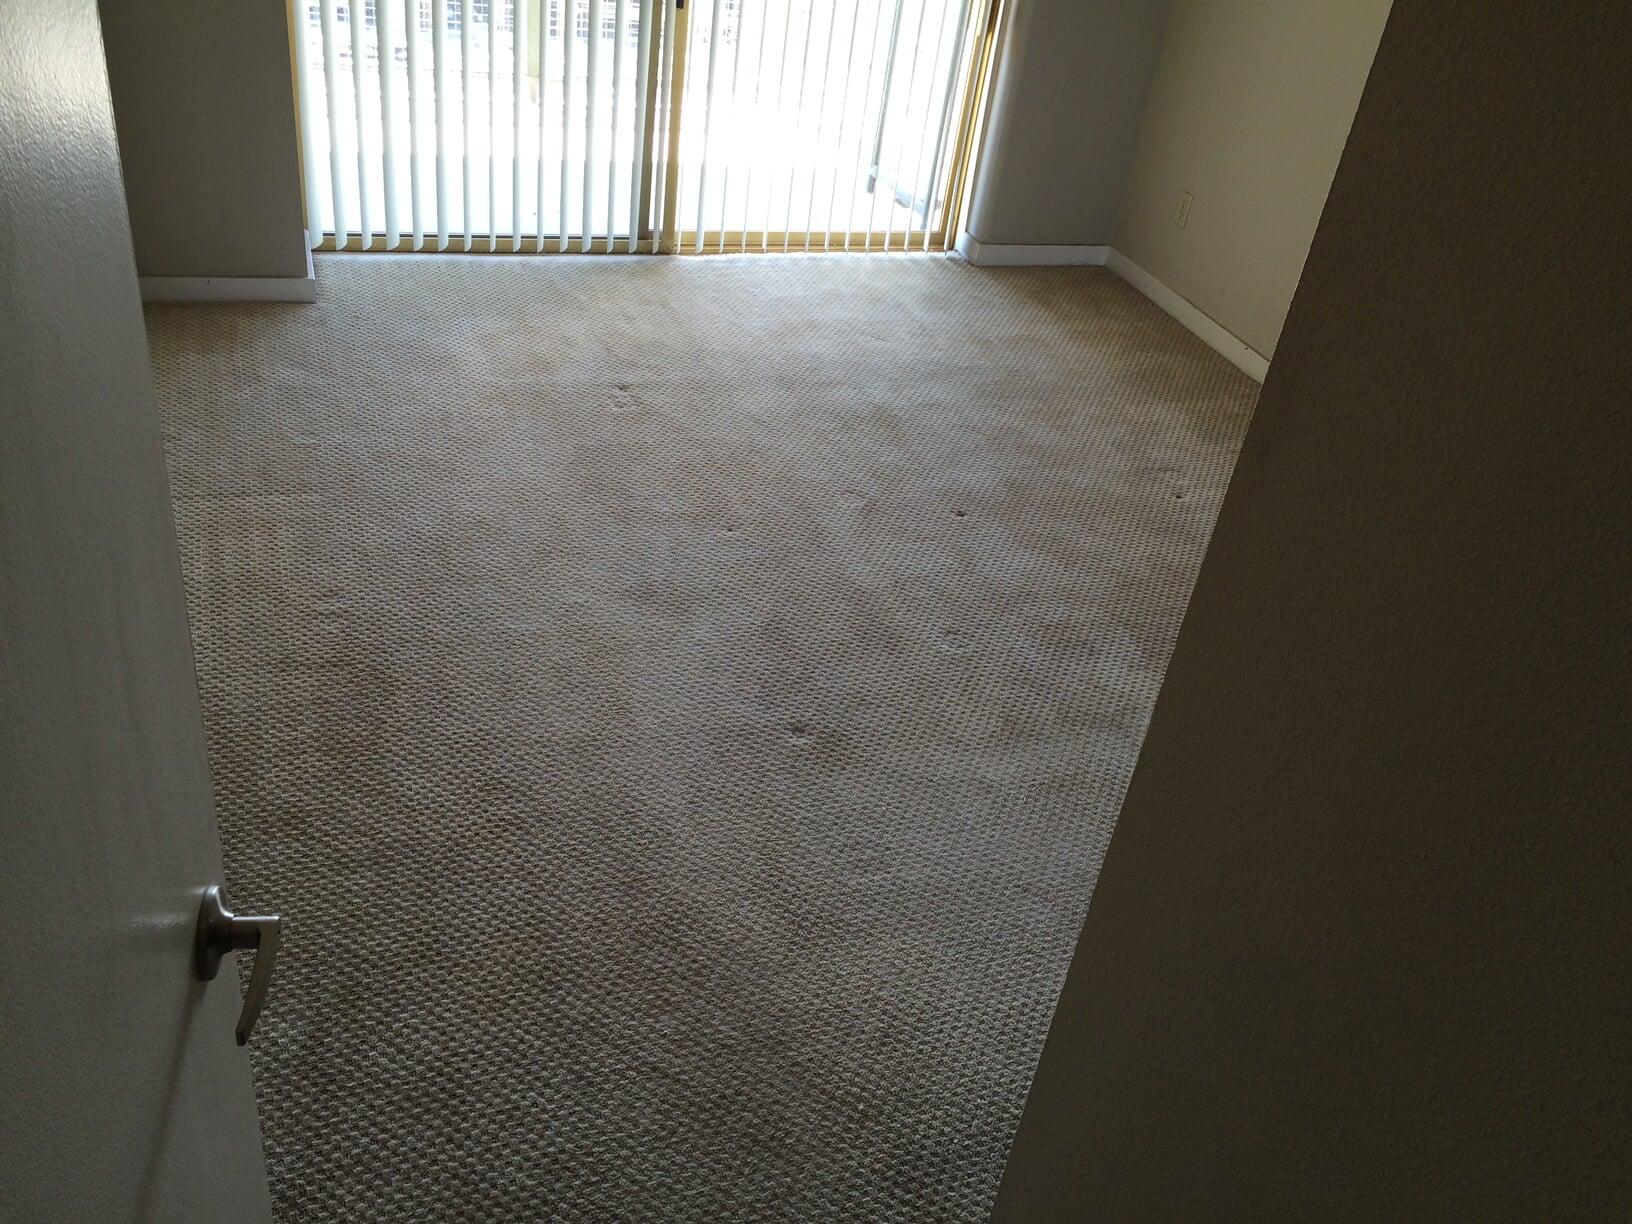 Soft new carpet flooring in Scottsdale, AZ from Cornerstone Flooring Brokers